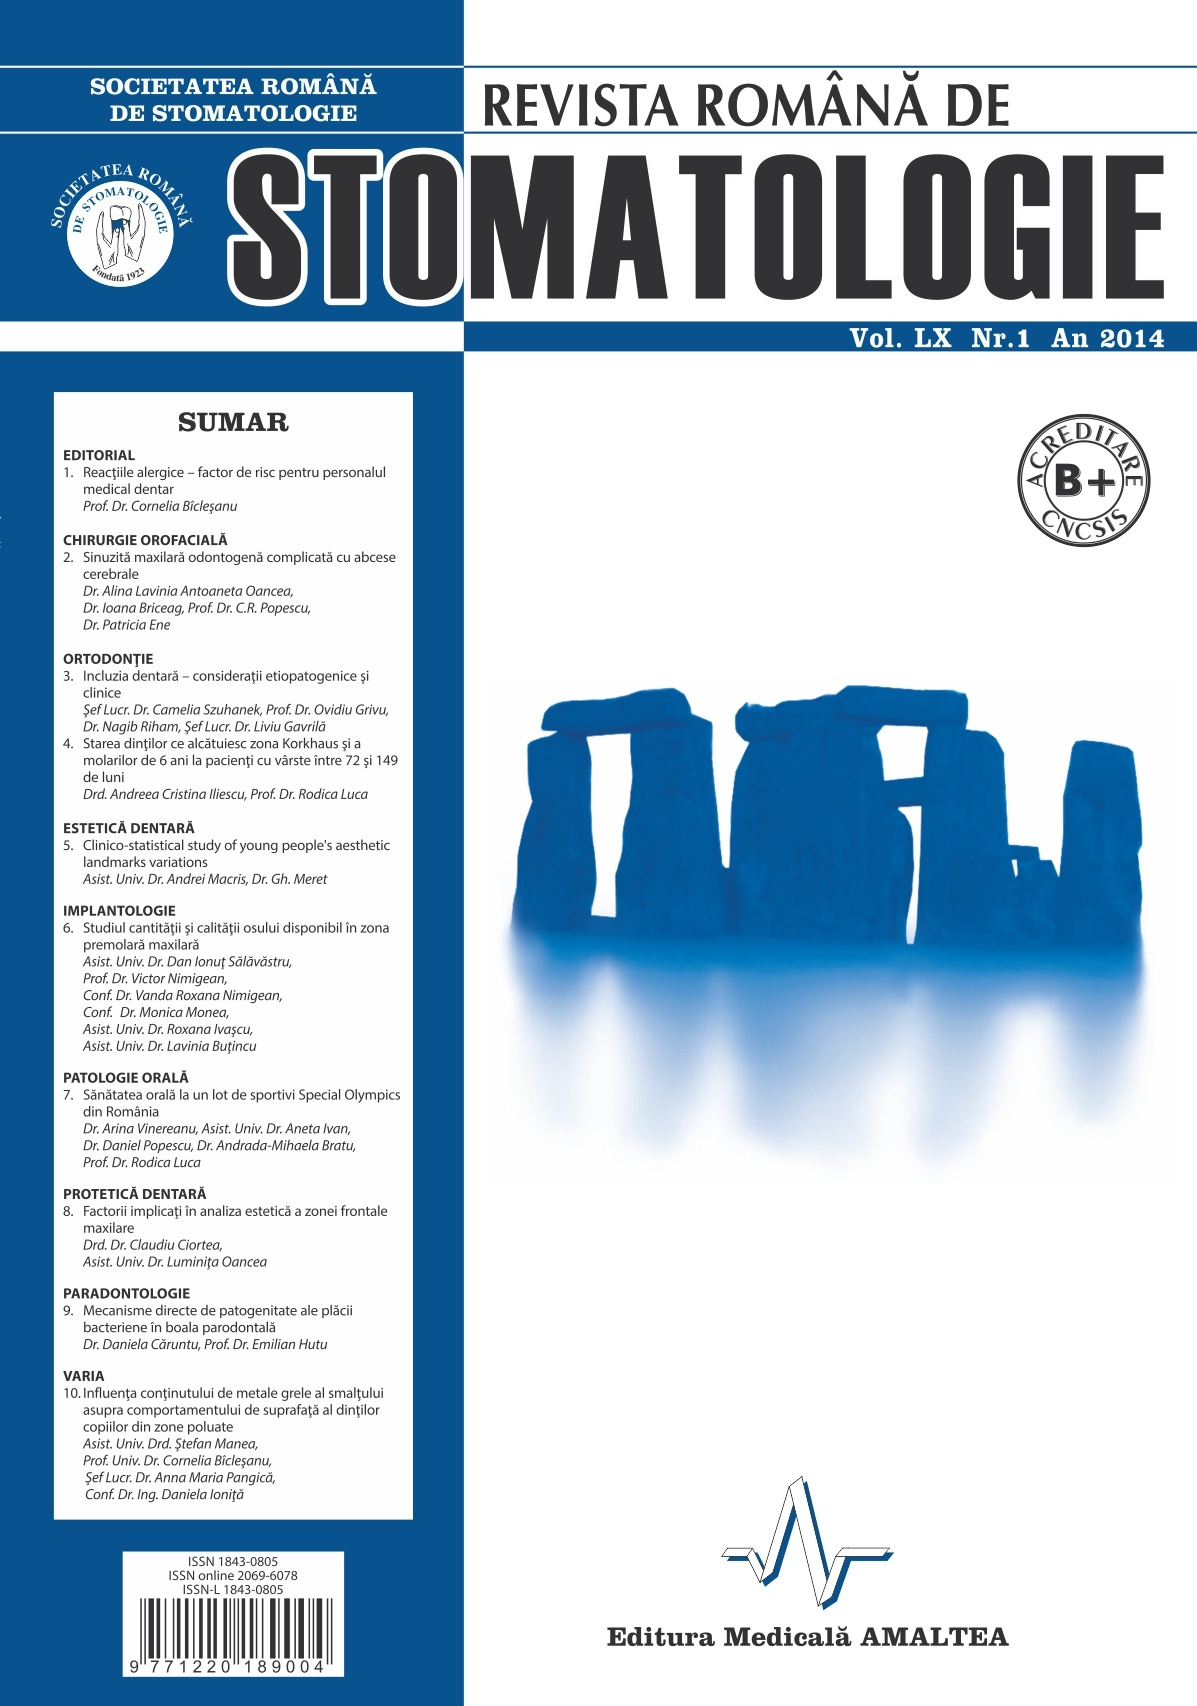 Revista Romana de STOMATOLOGIE - Romanian Journal of Stomatology, Vol. LX, Nr. 1, An 2014